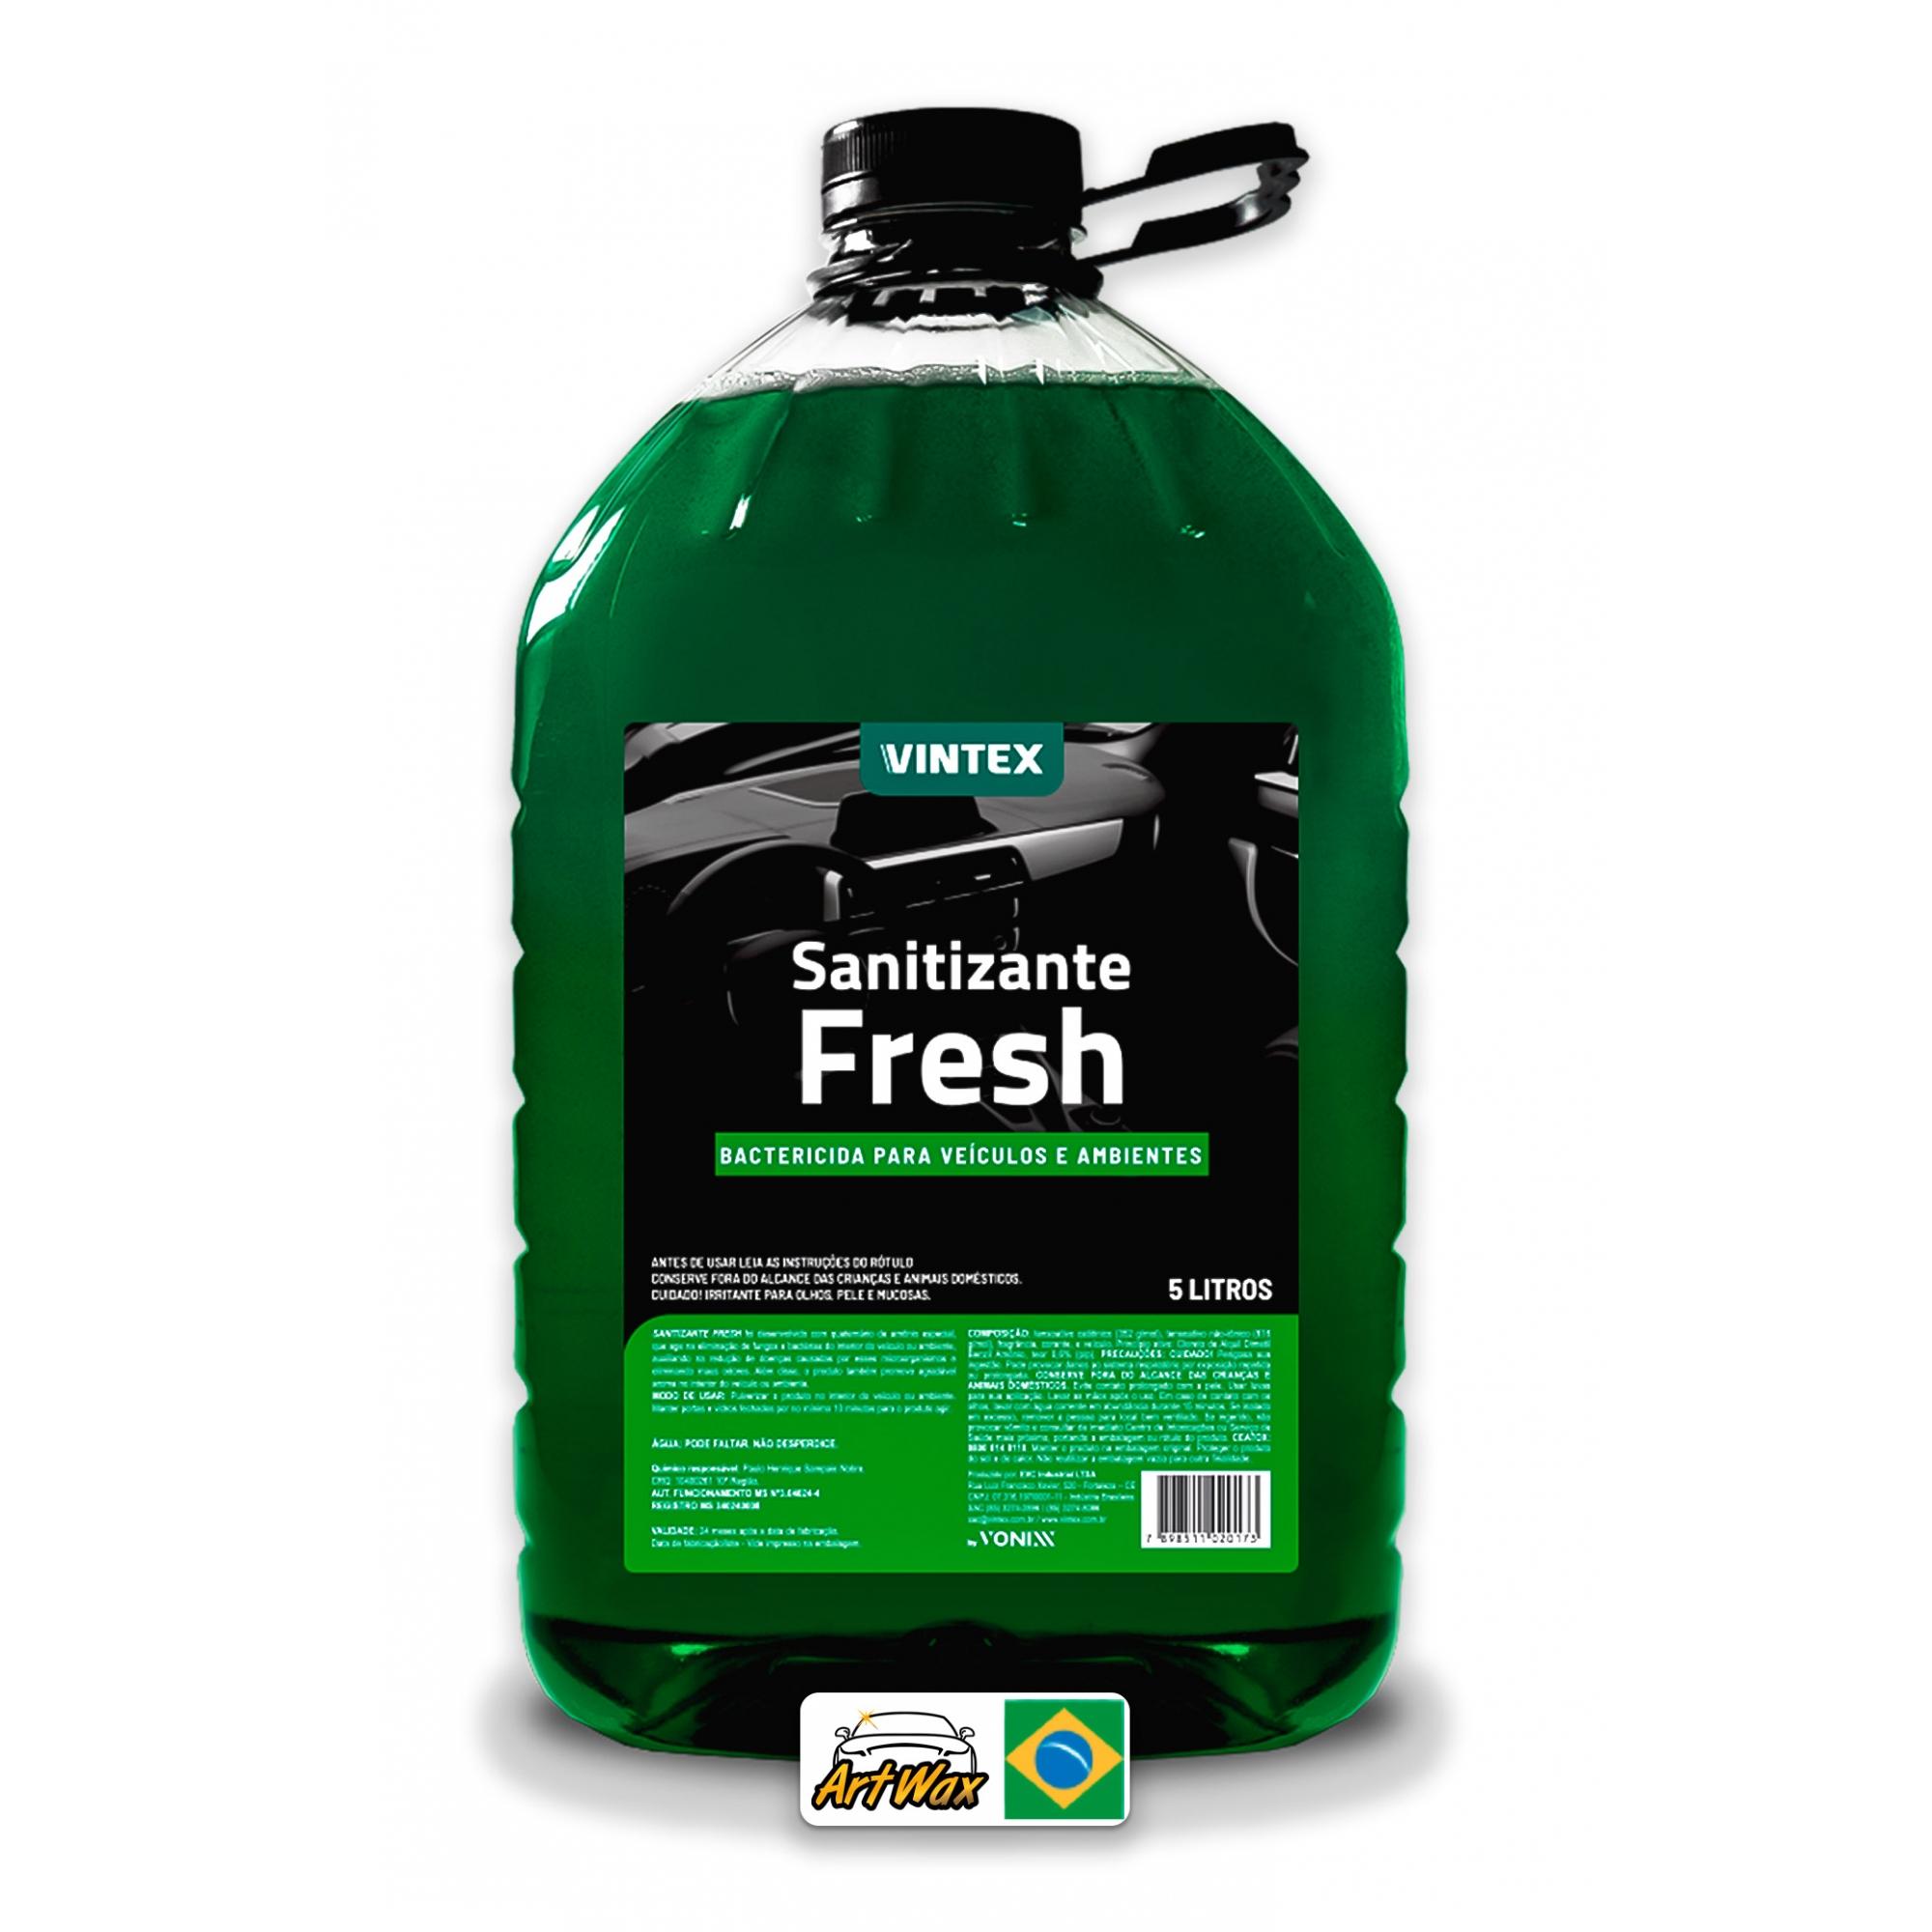 Sanitizante Fresh 5L - Aromatizante com Poder Bactericida